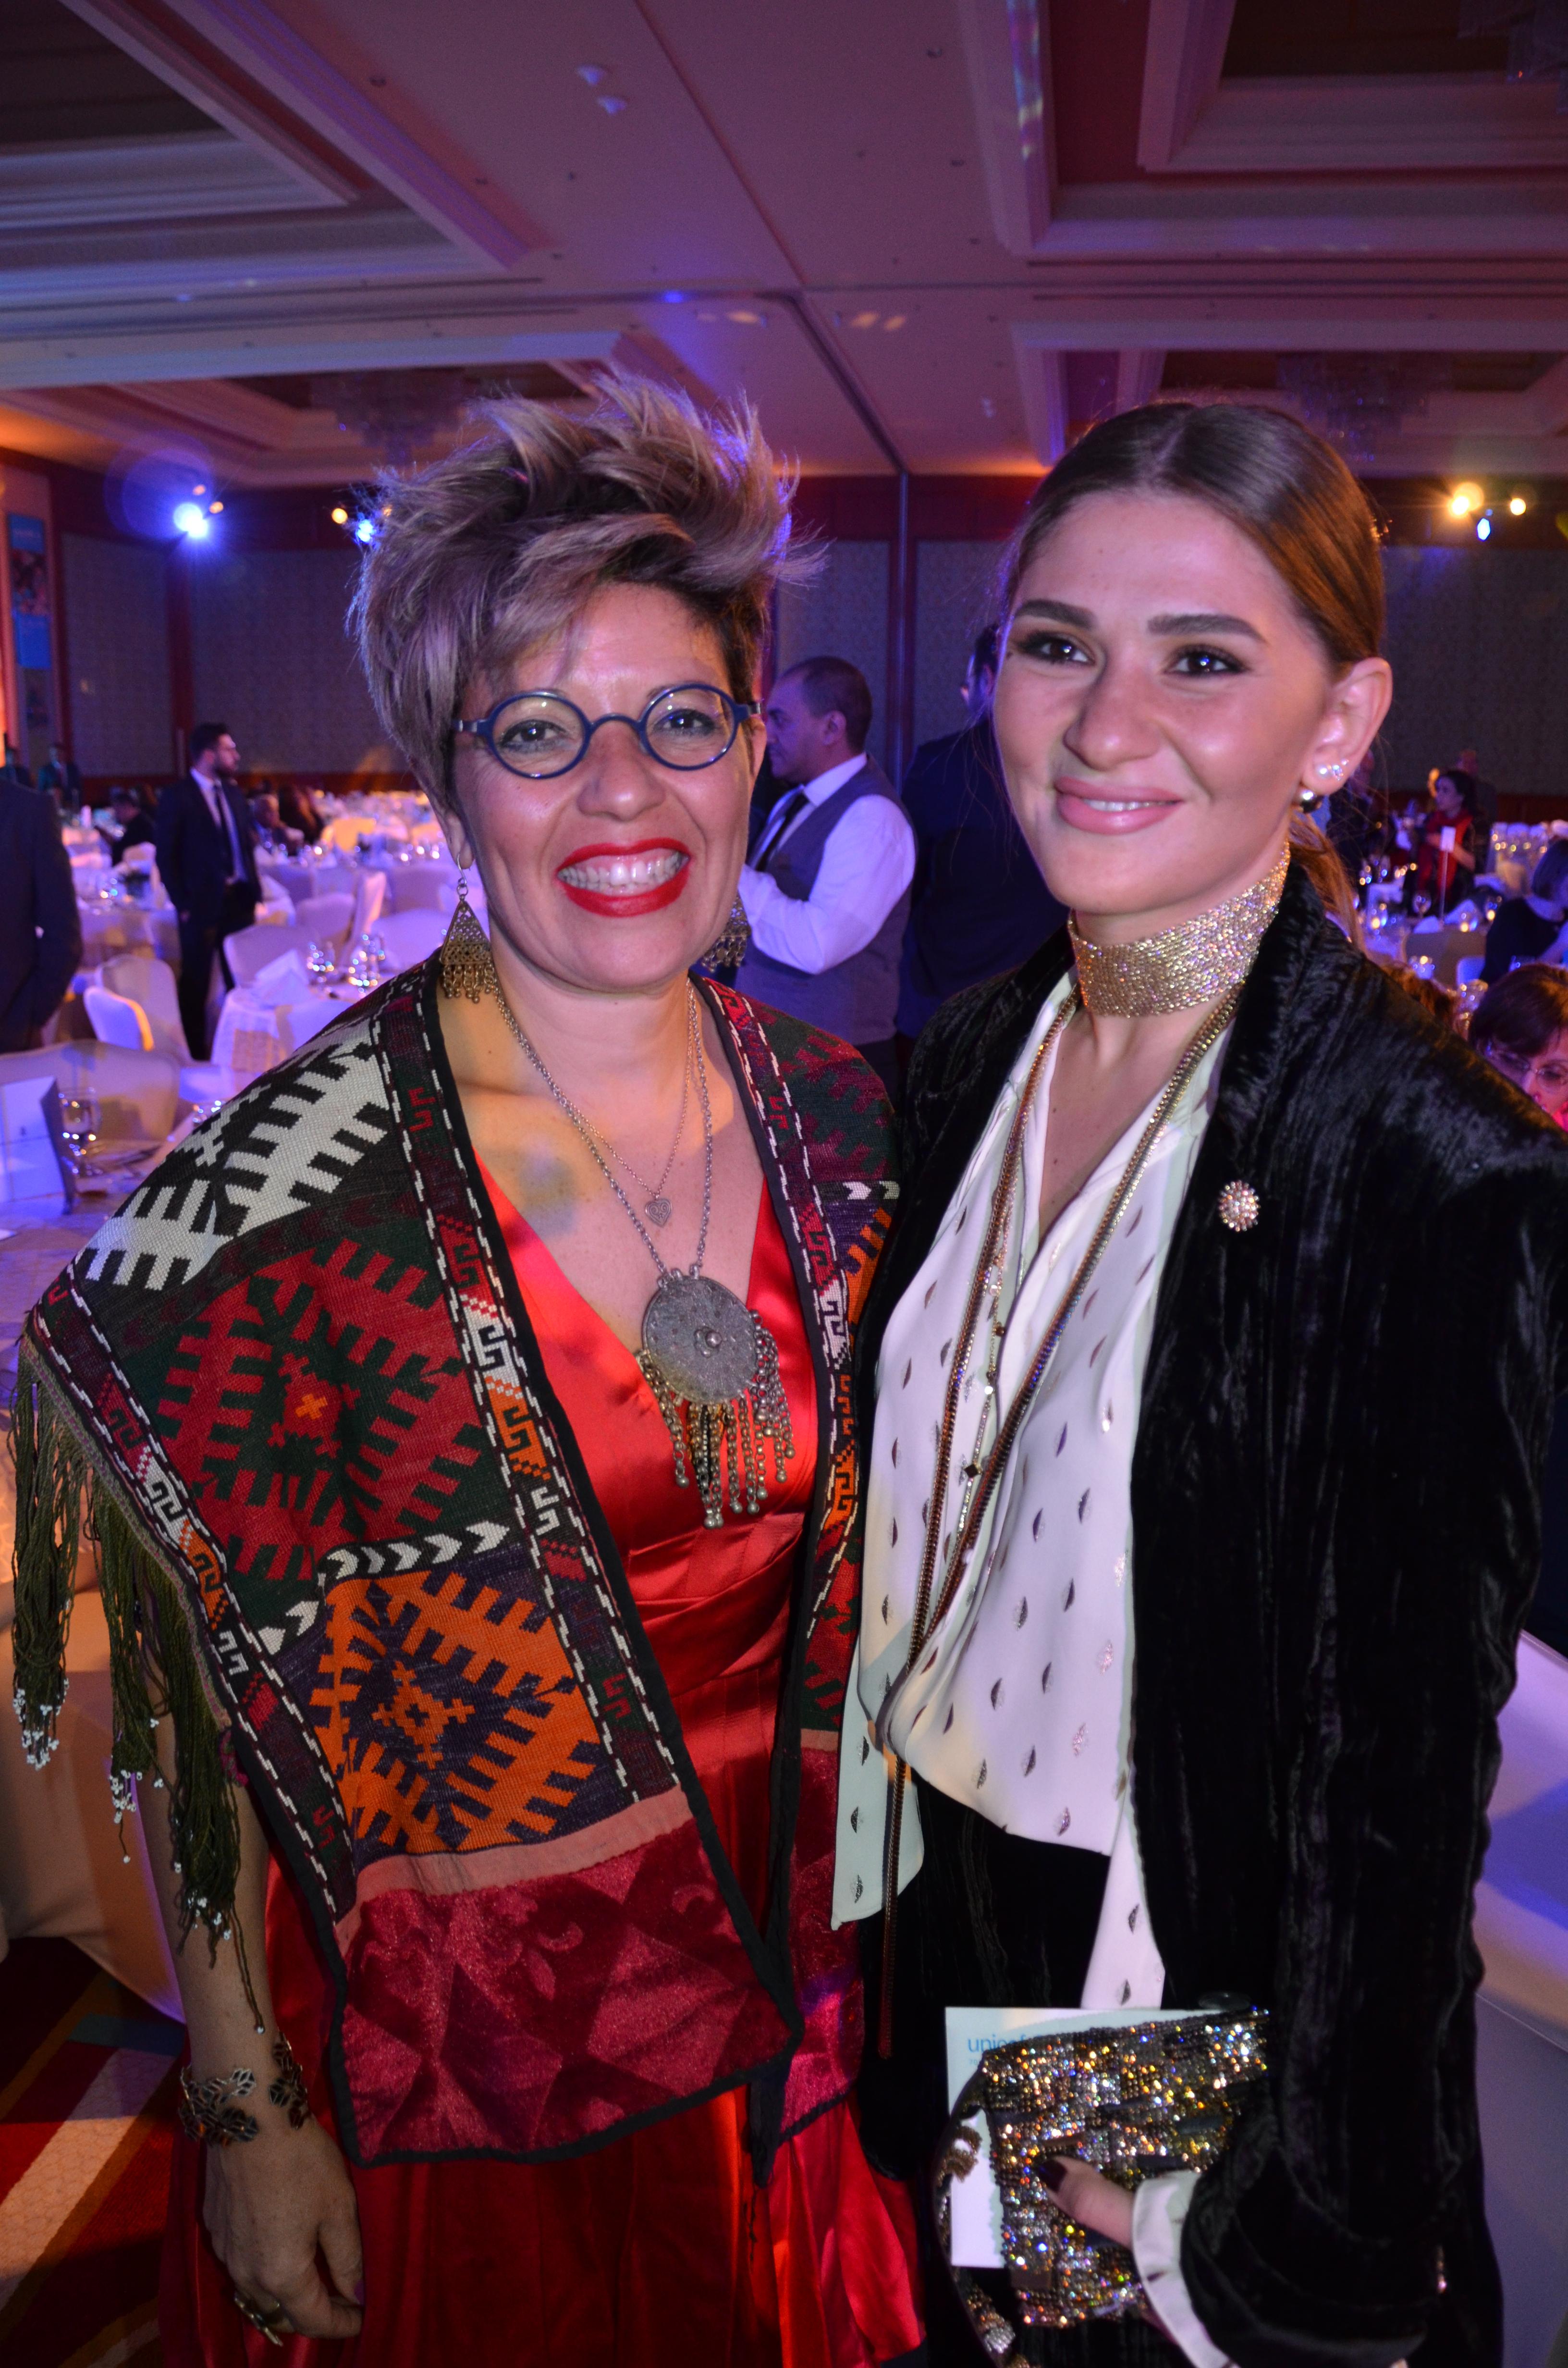 Ms. Dalia Abou-Senna & Ms. Noha Elsherbiny